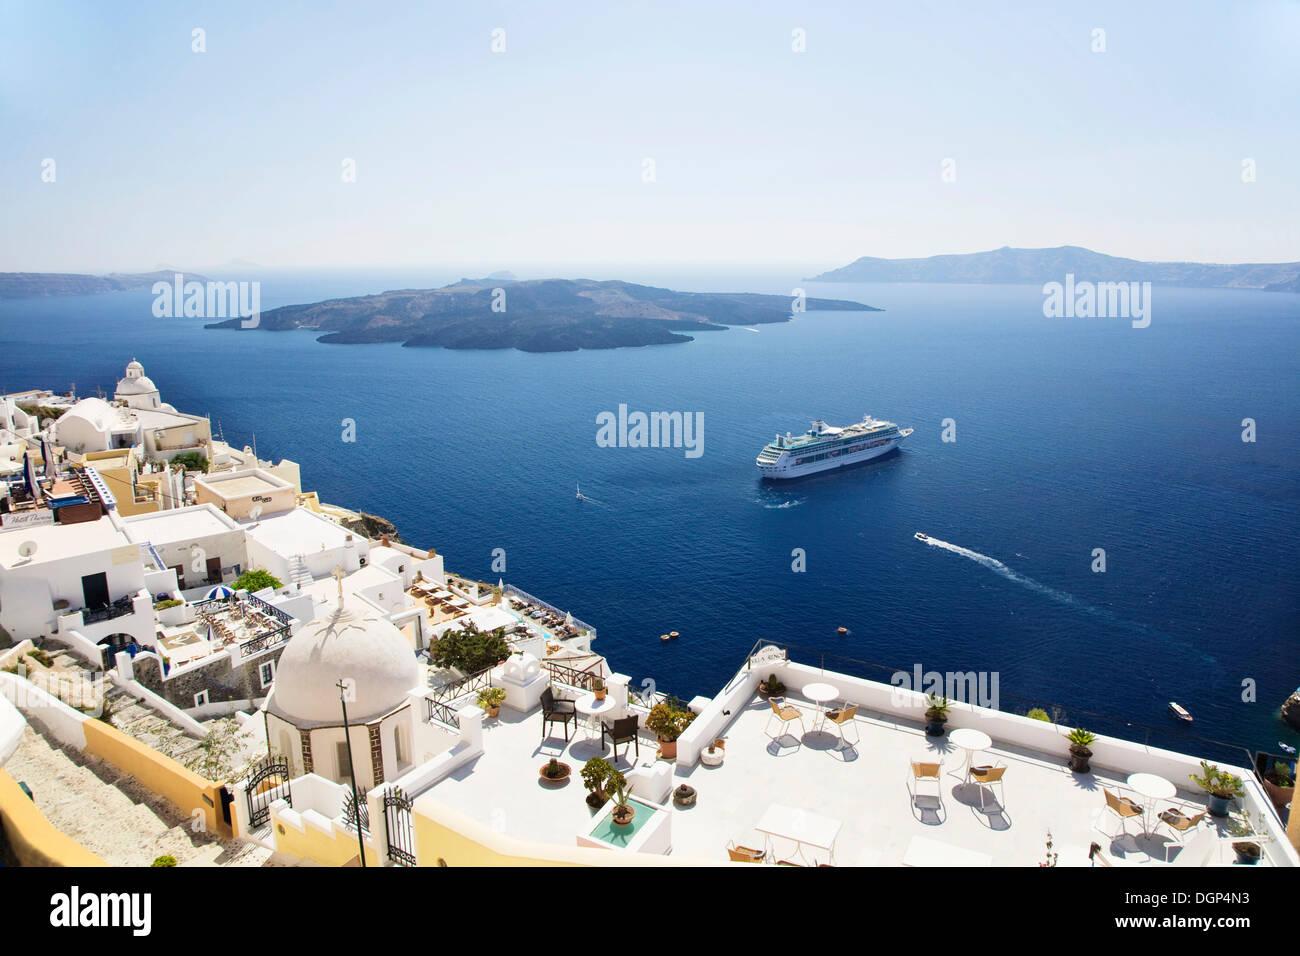 Ocean liner anchored off Fira, Santorini, Cyclades, Greece, Europe - Stock Image